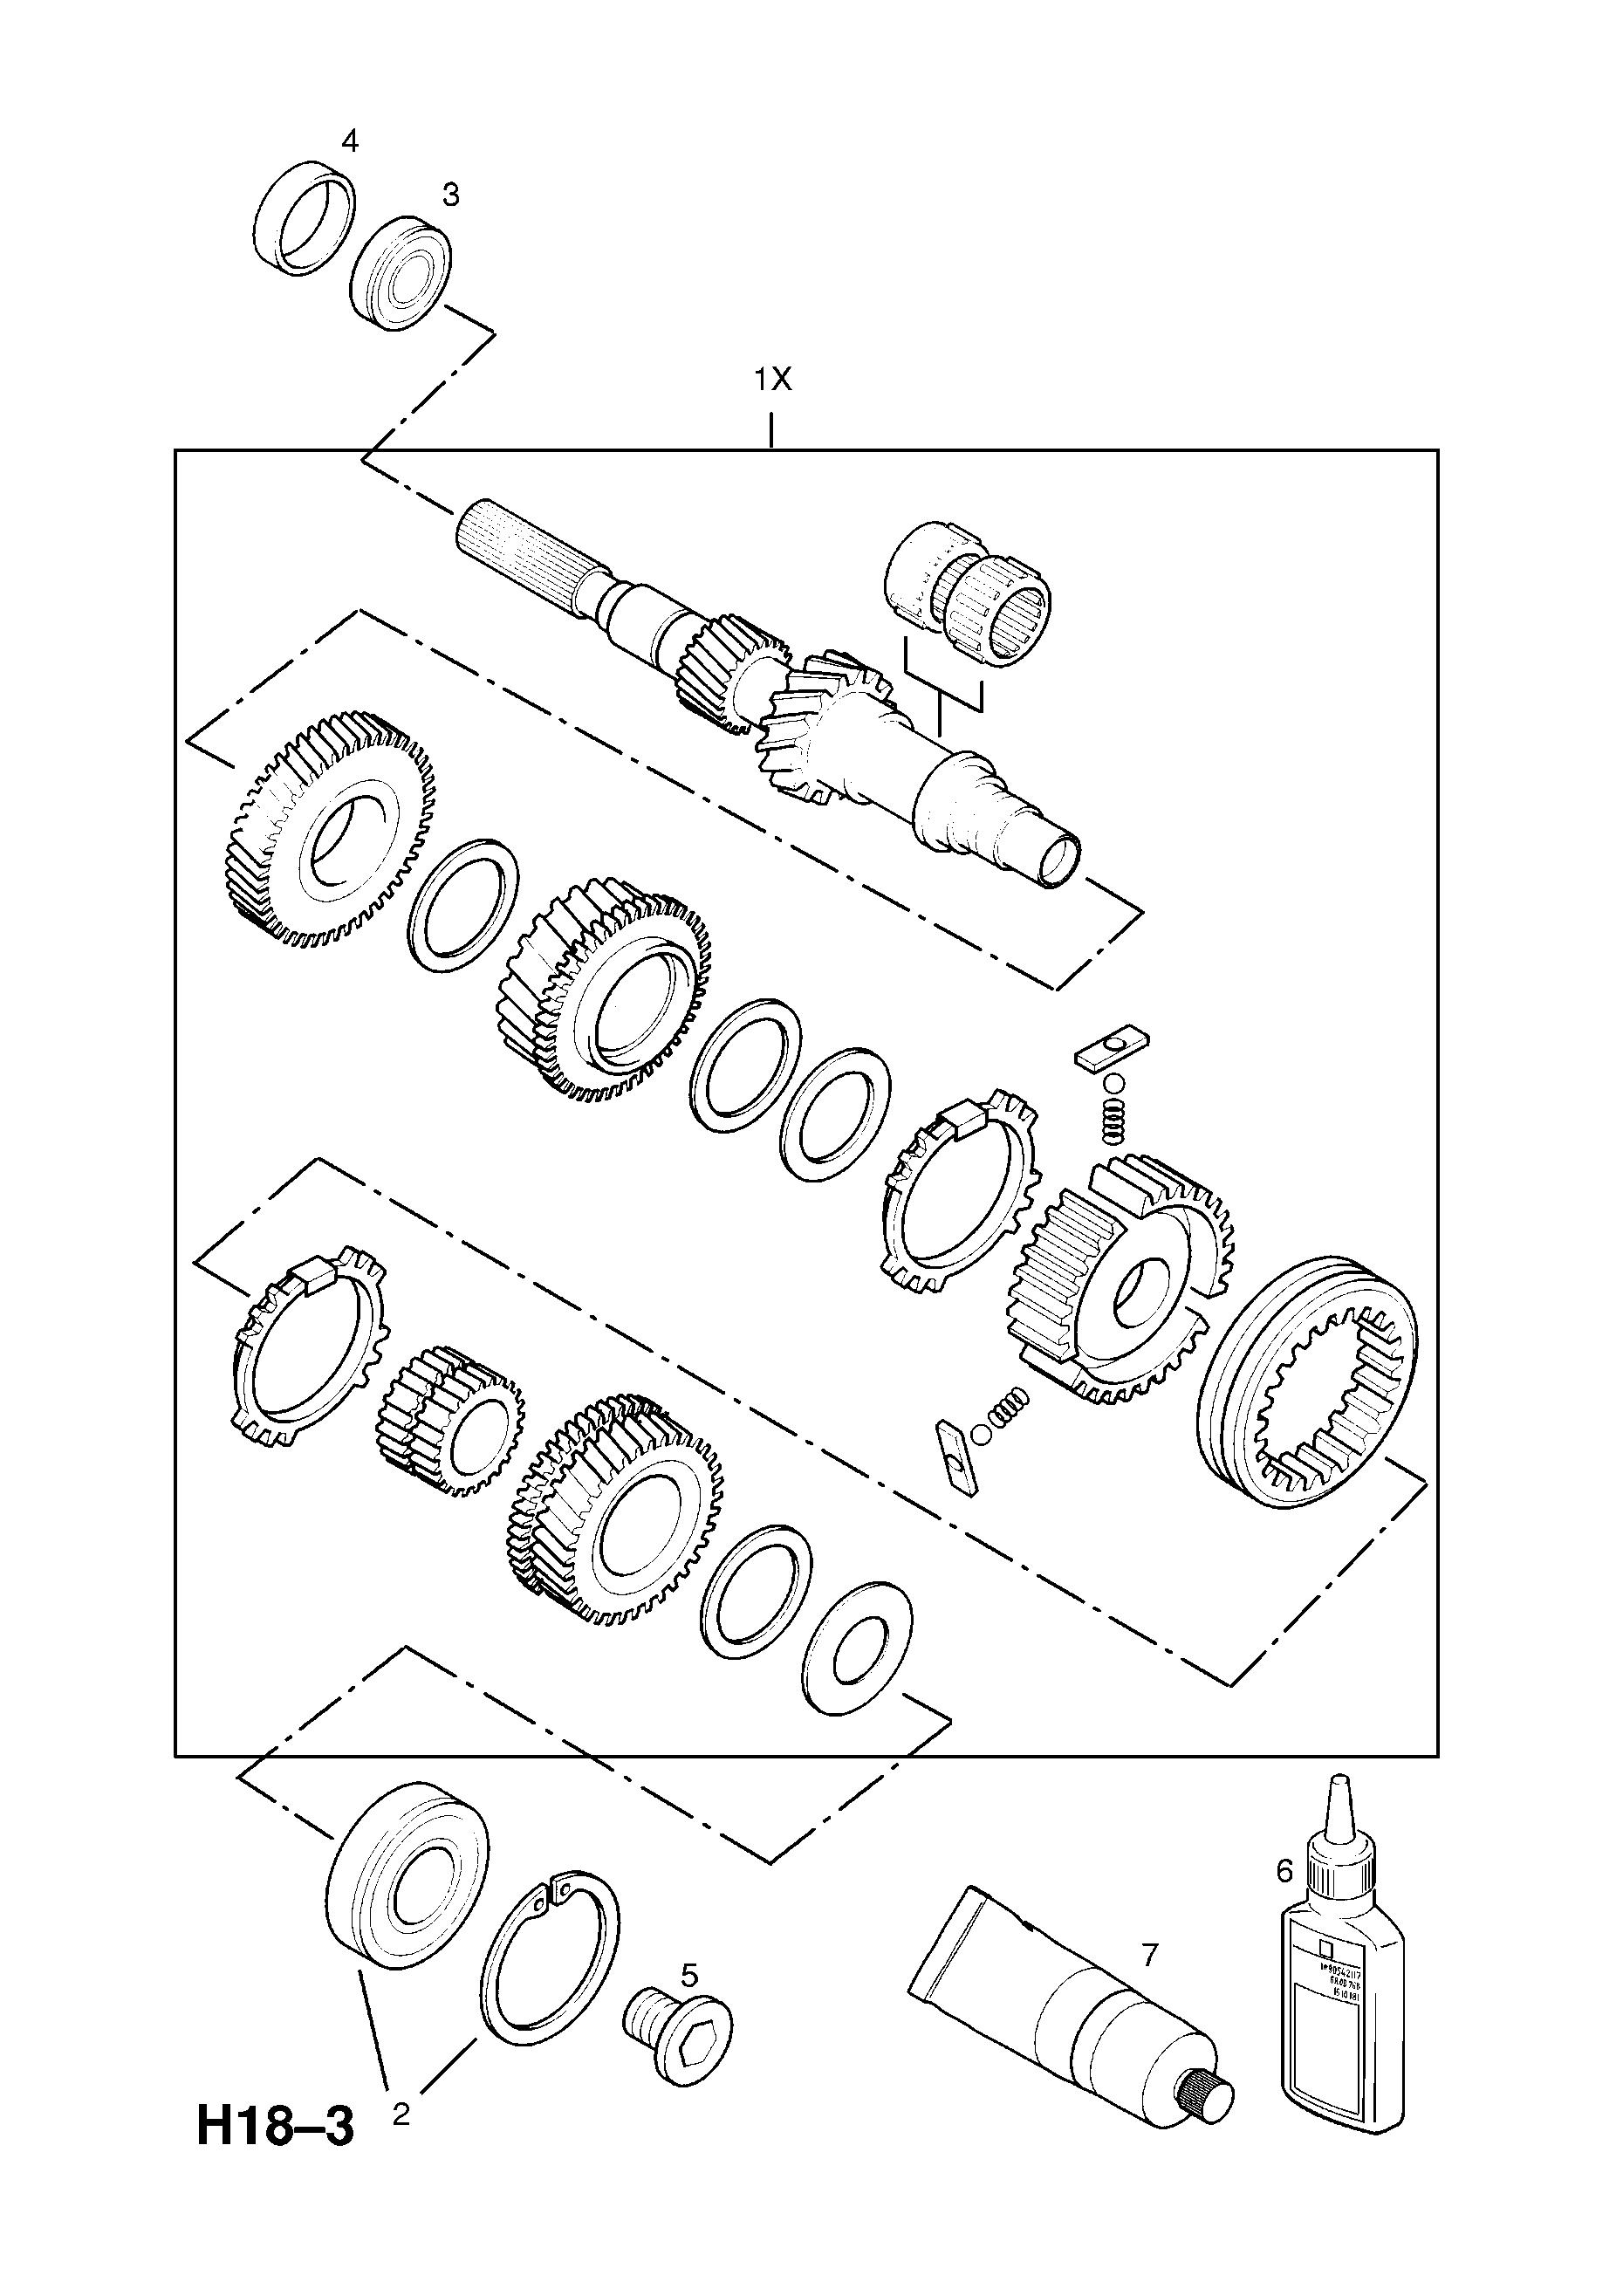 astra g w0l0tgf35y8168889 h transmission 4 f23 manual transmission Astra Interior list of parts